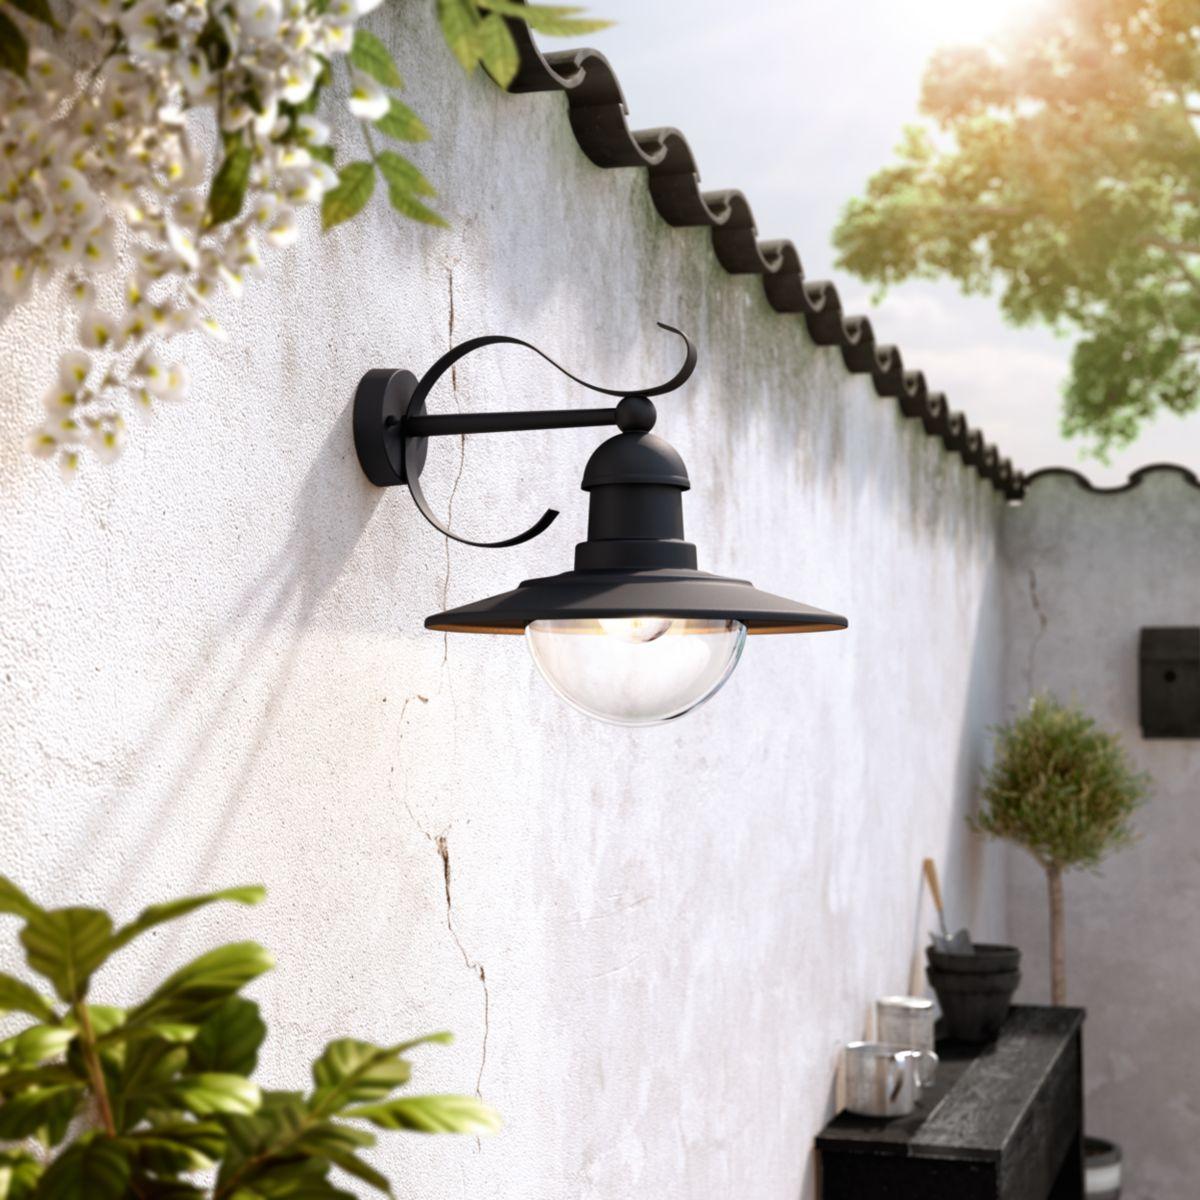 Mygarden Wall Light 0181630pn Philips